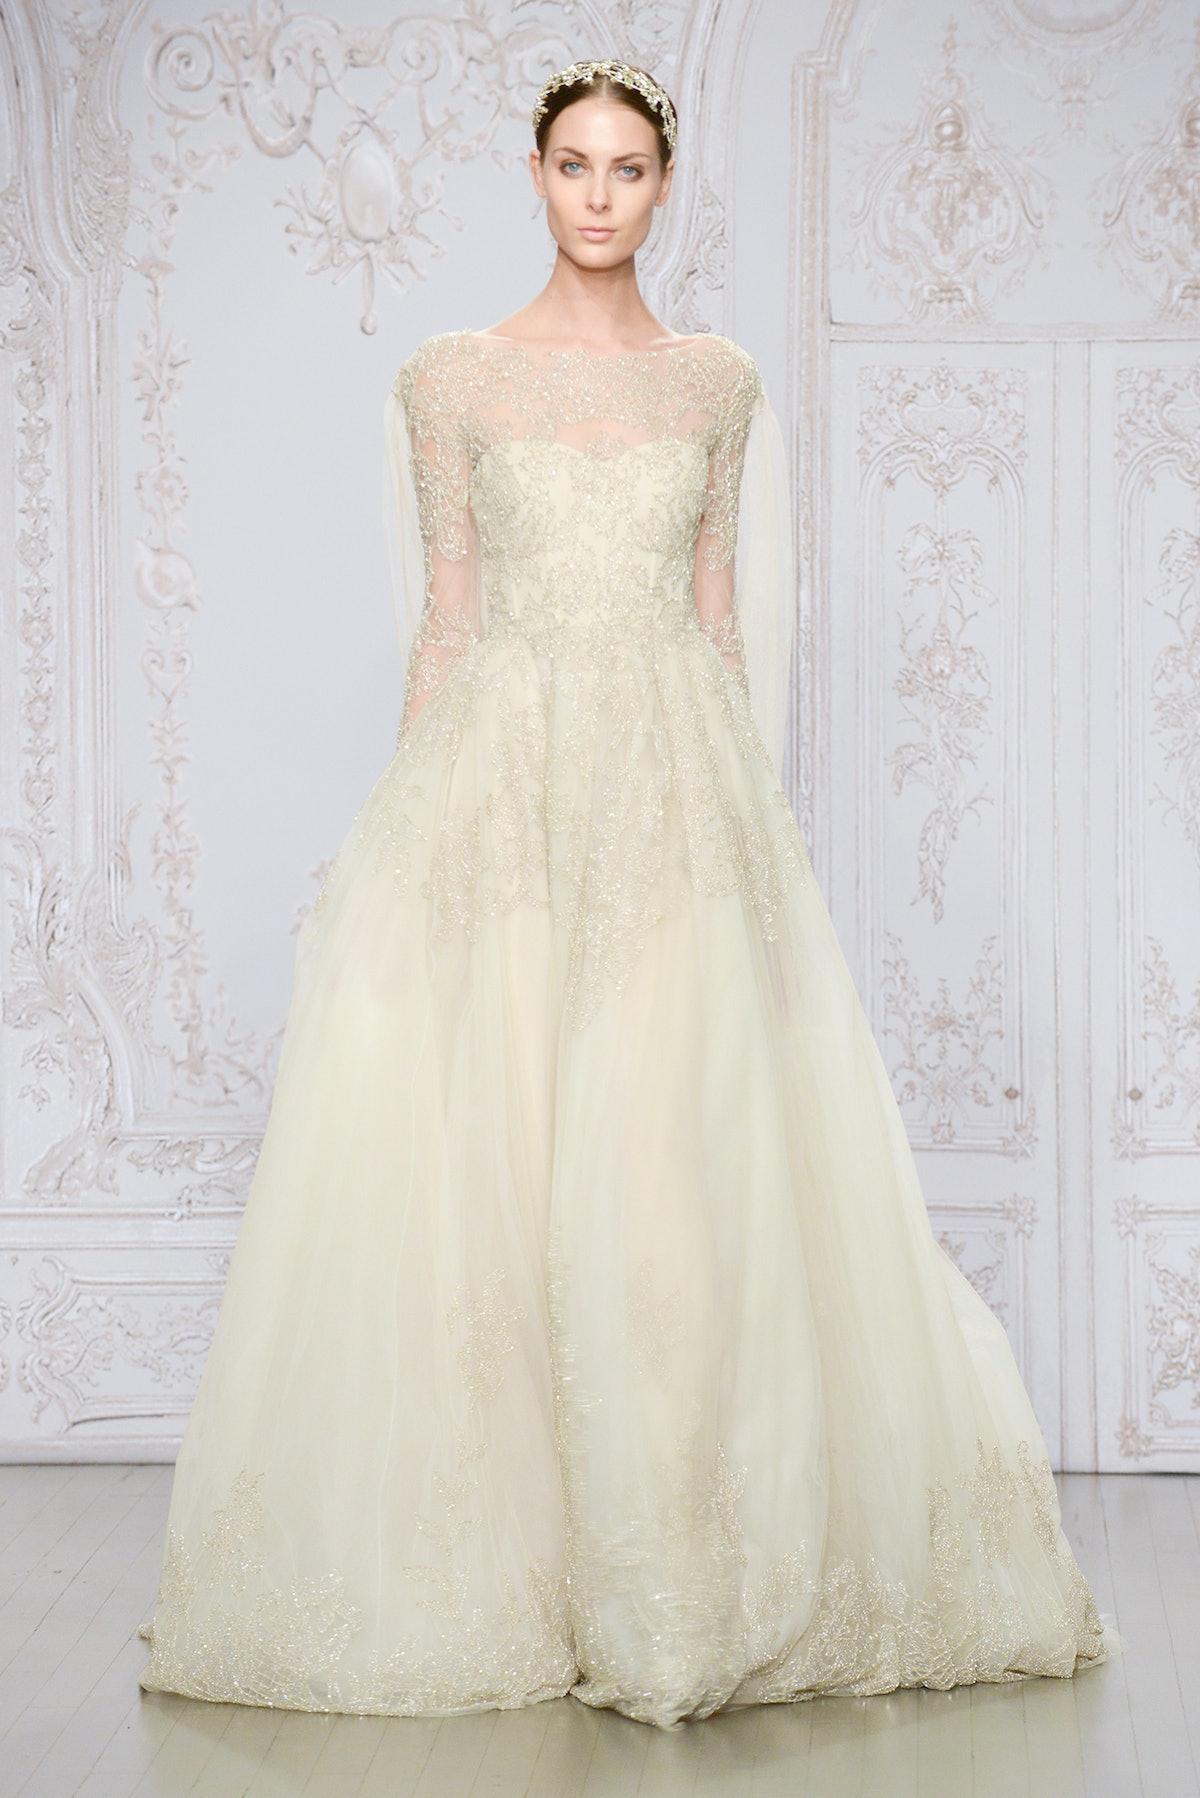 Monique Lhuiller wedding